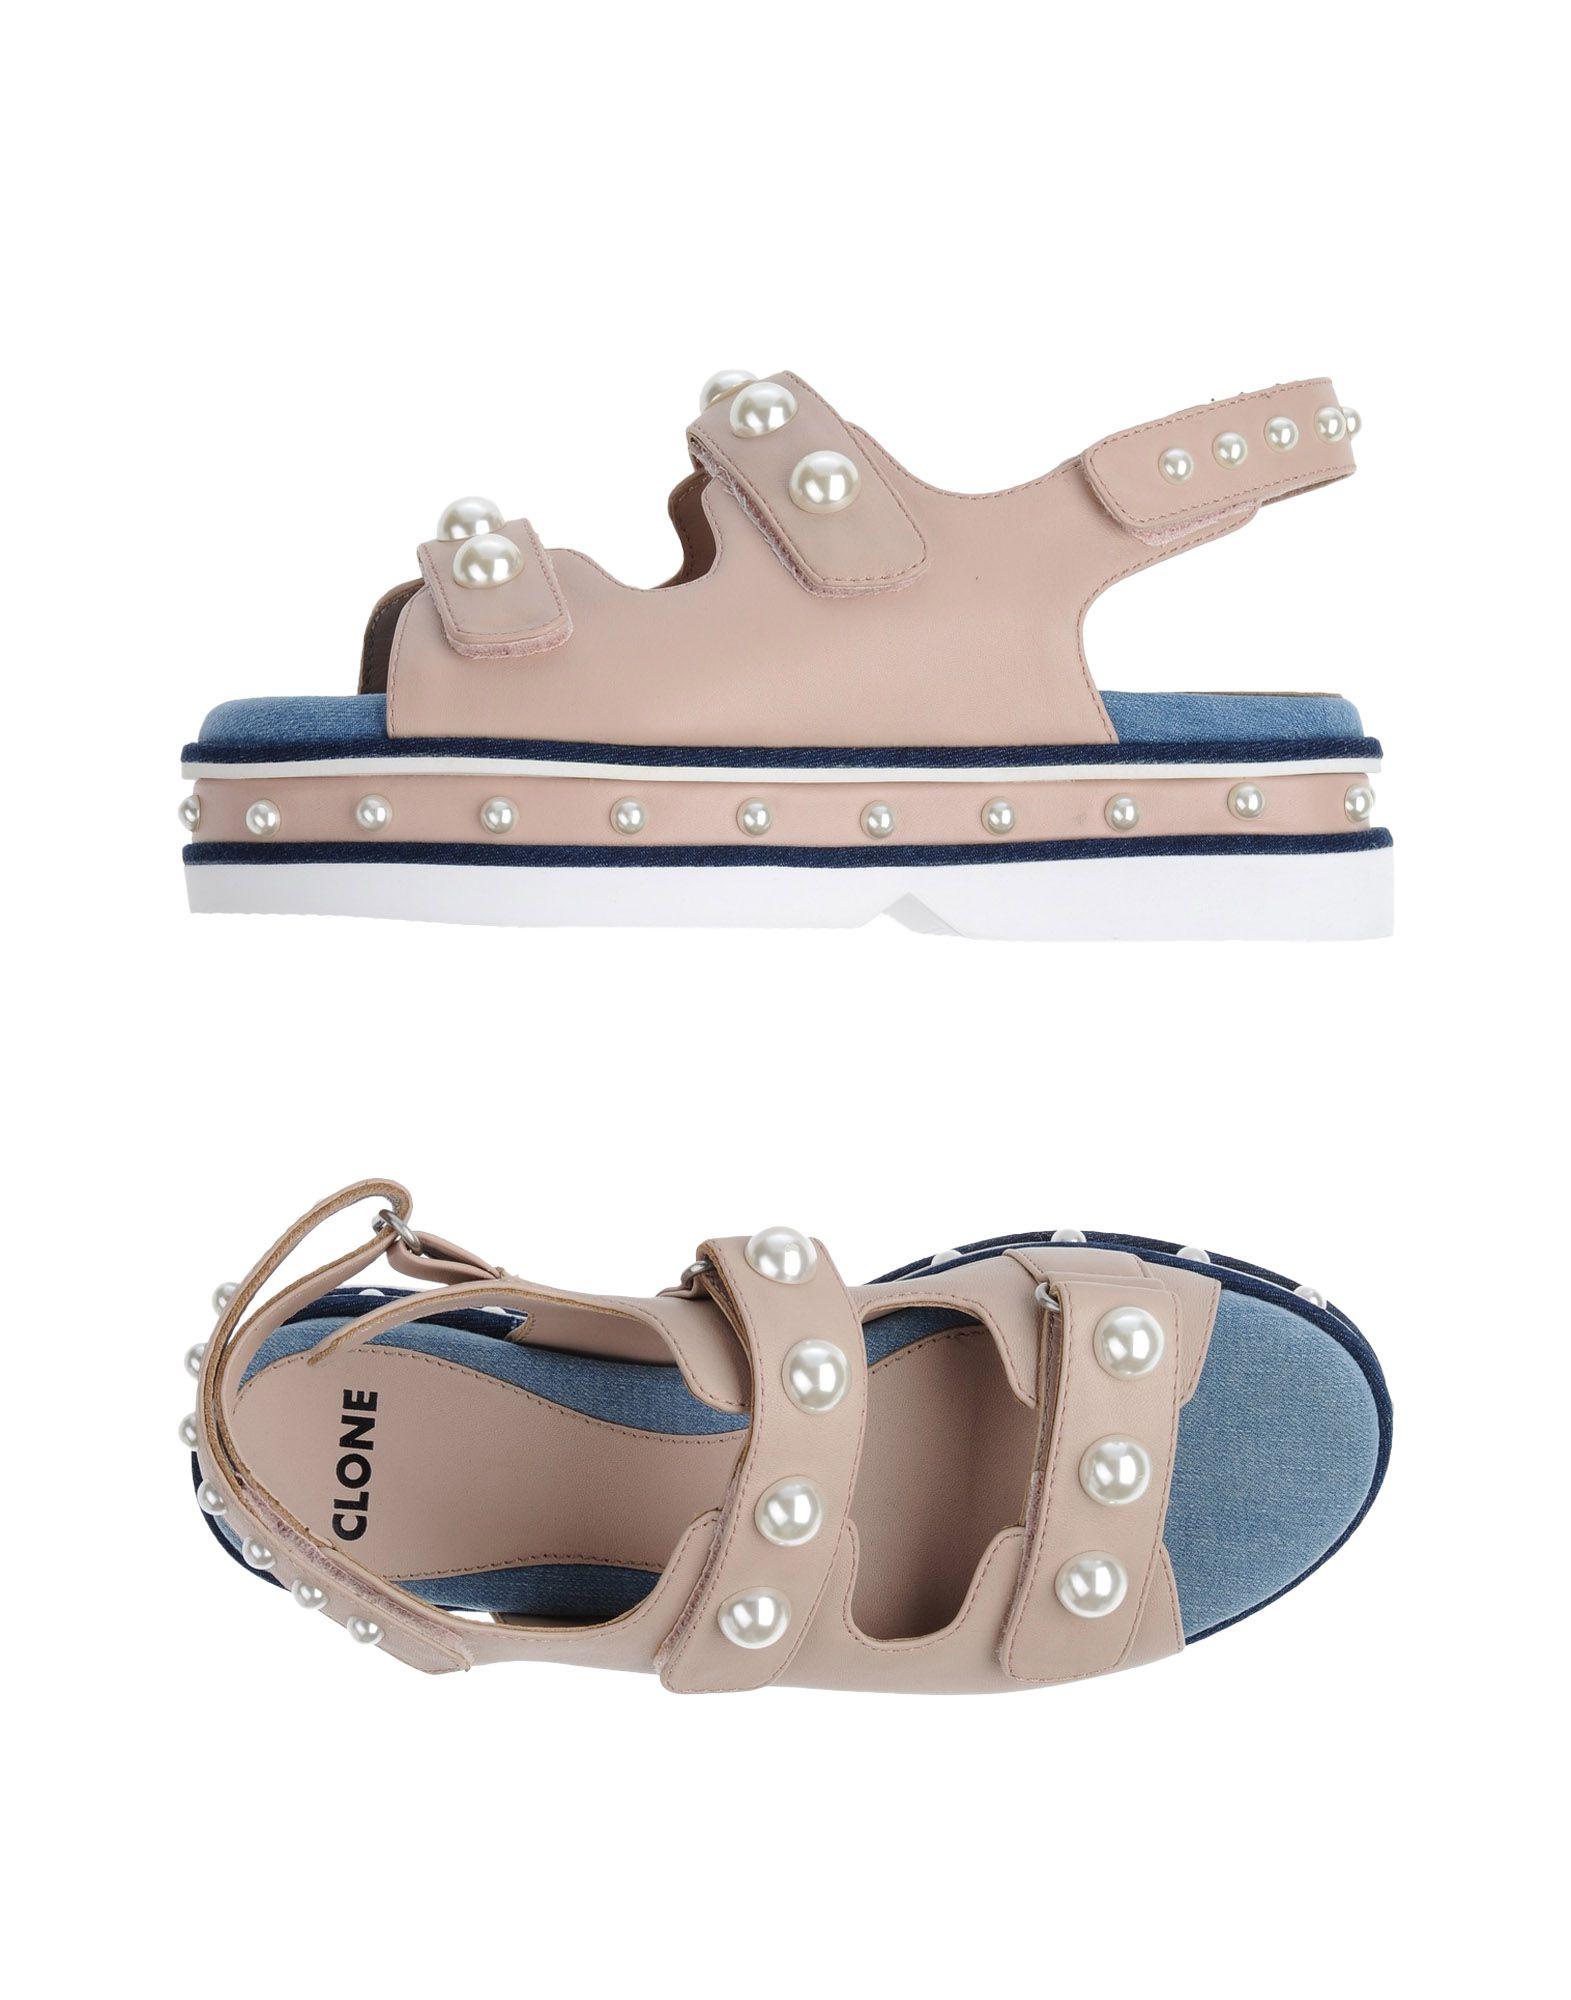 Clone Sandalen Damen  11348393HW Gute Qualität beliebte Schuhe